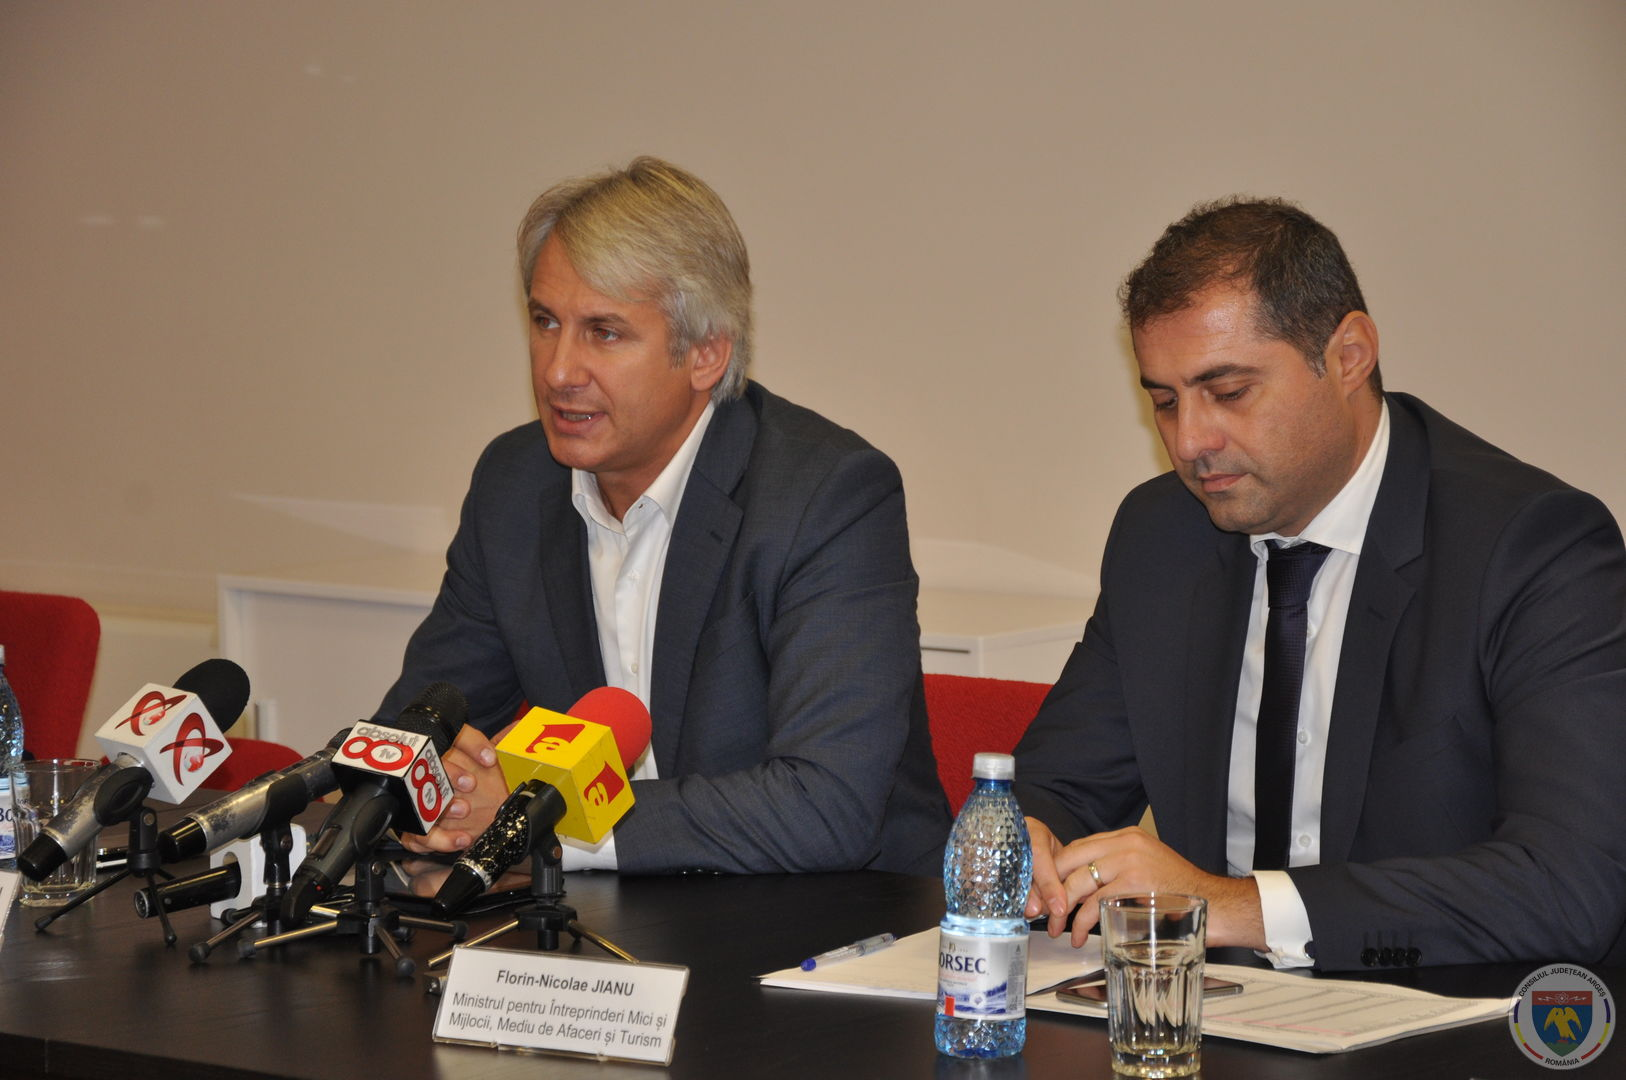 Conferinta Ministrii Teodorovici & Jianu 11.11.2014 (6).JPG